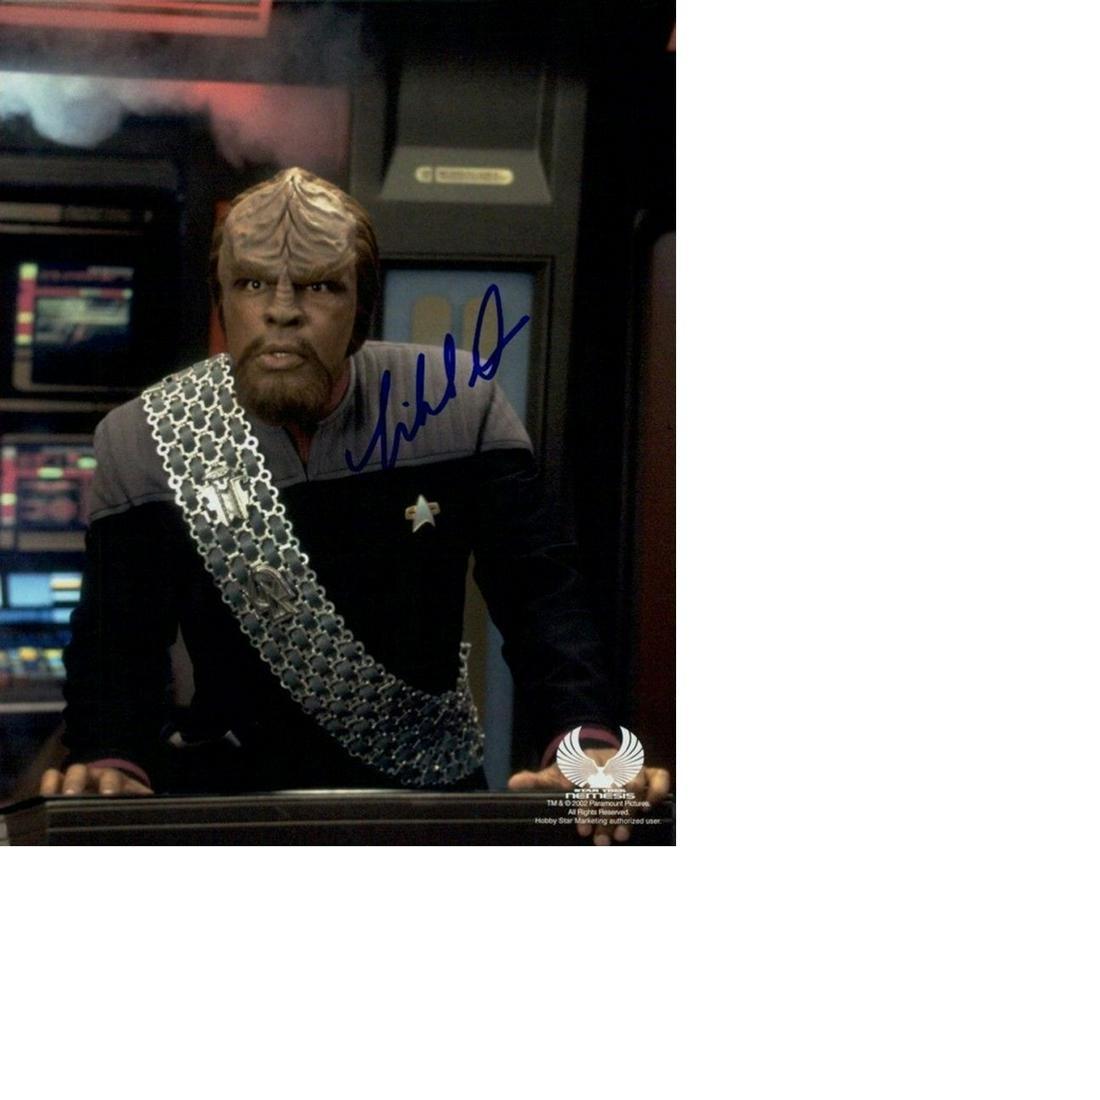 Michael Dorn Star Trek hand signed 10x8 photo. This